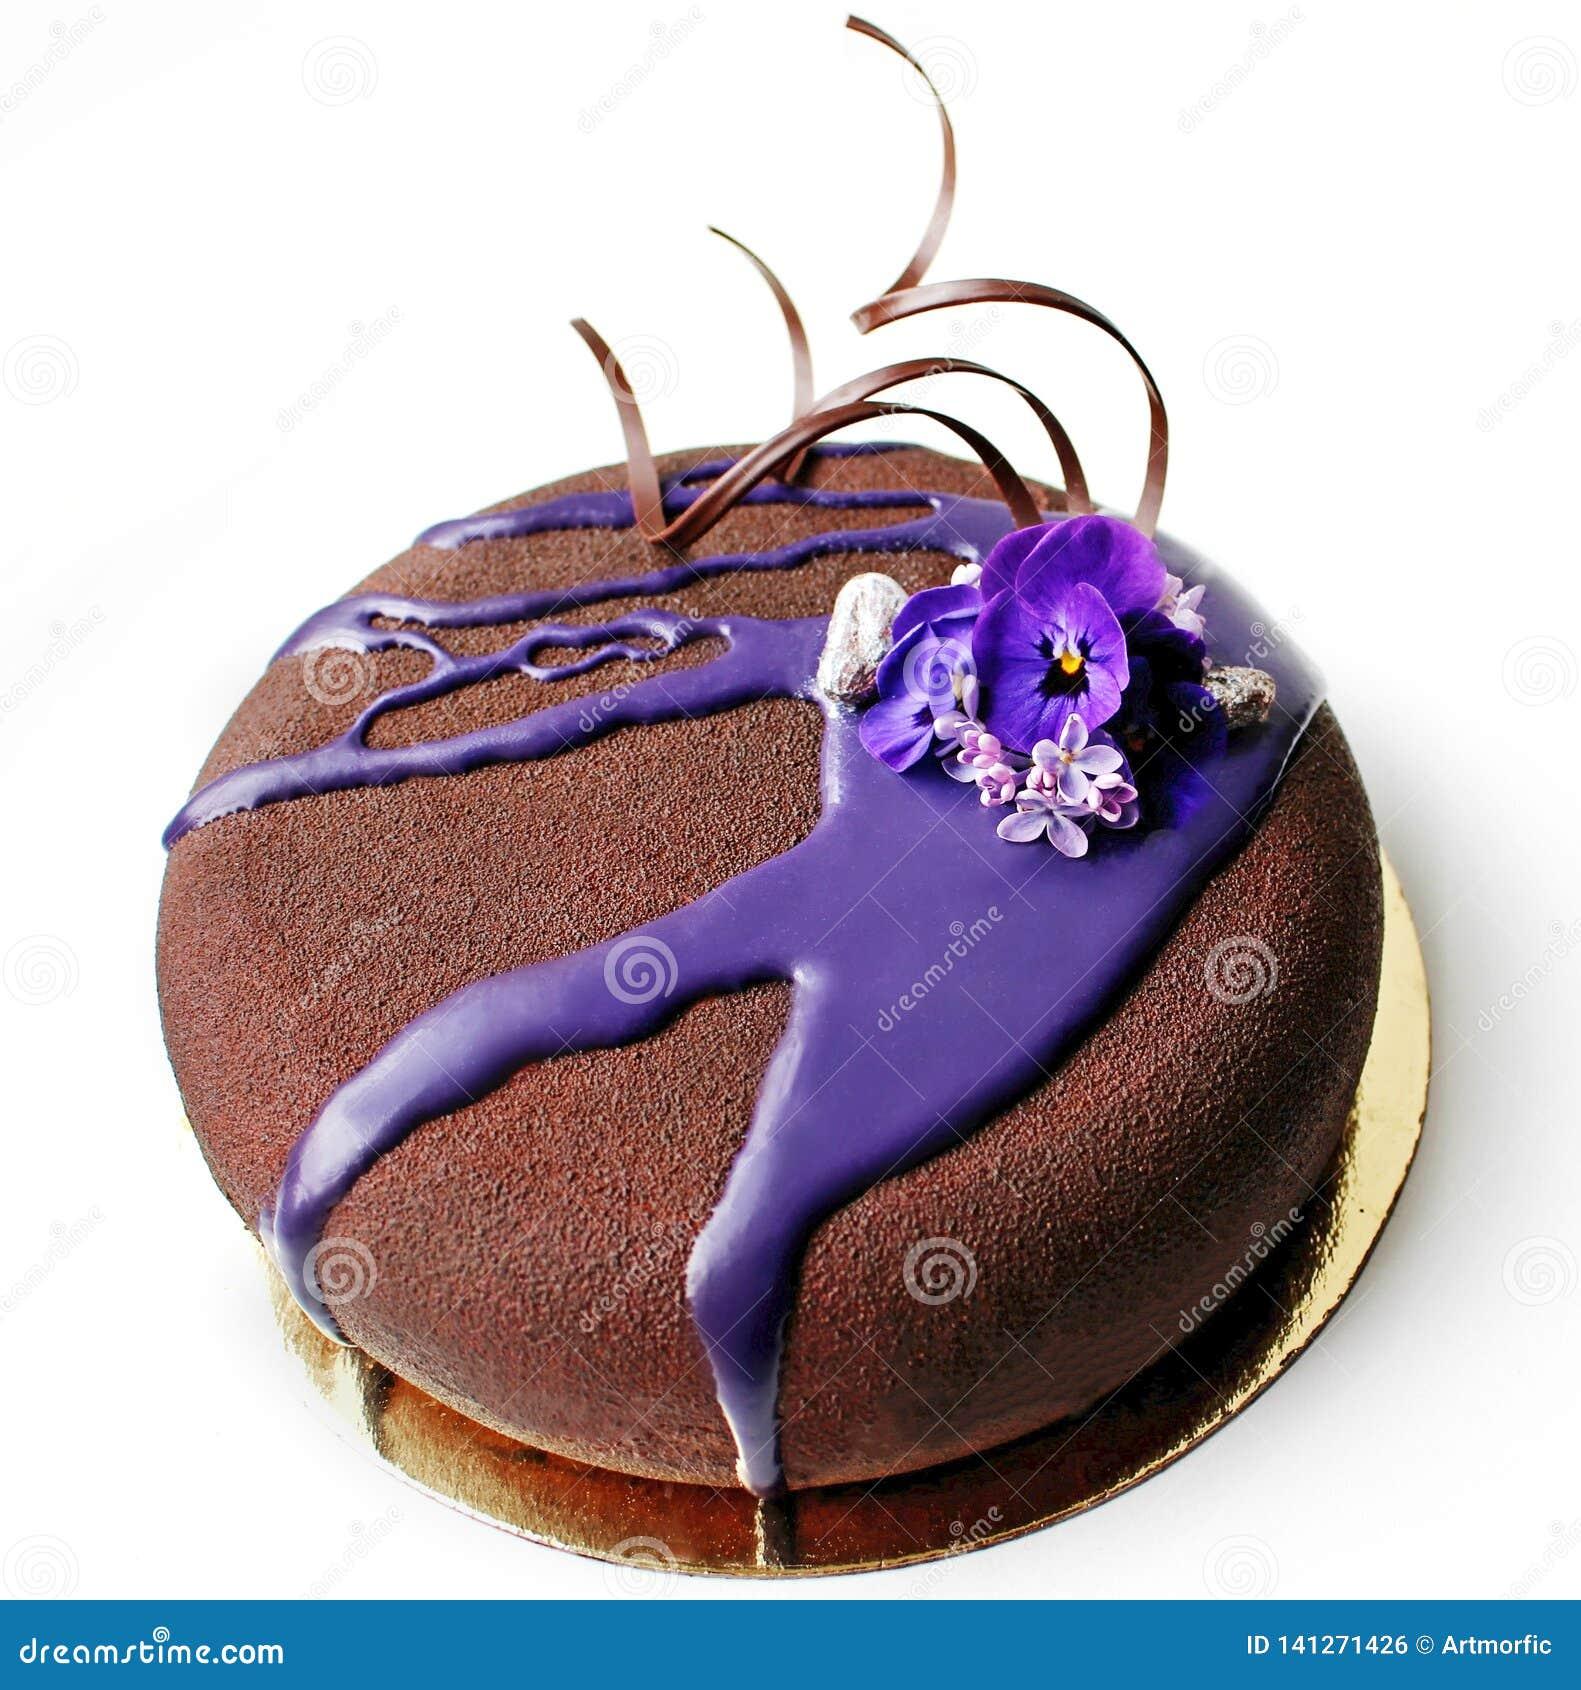 Dark chocolate cake with purple mirror glaze and spring flowers